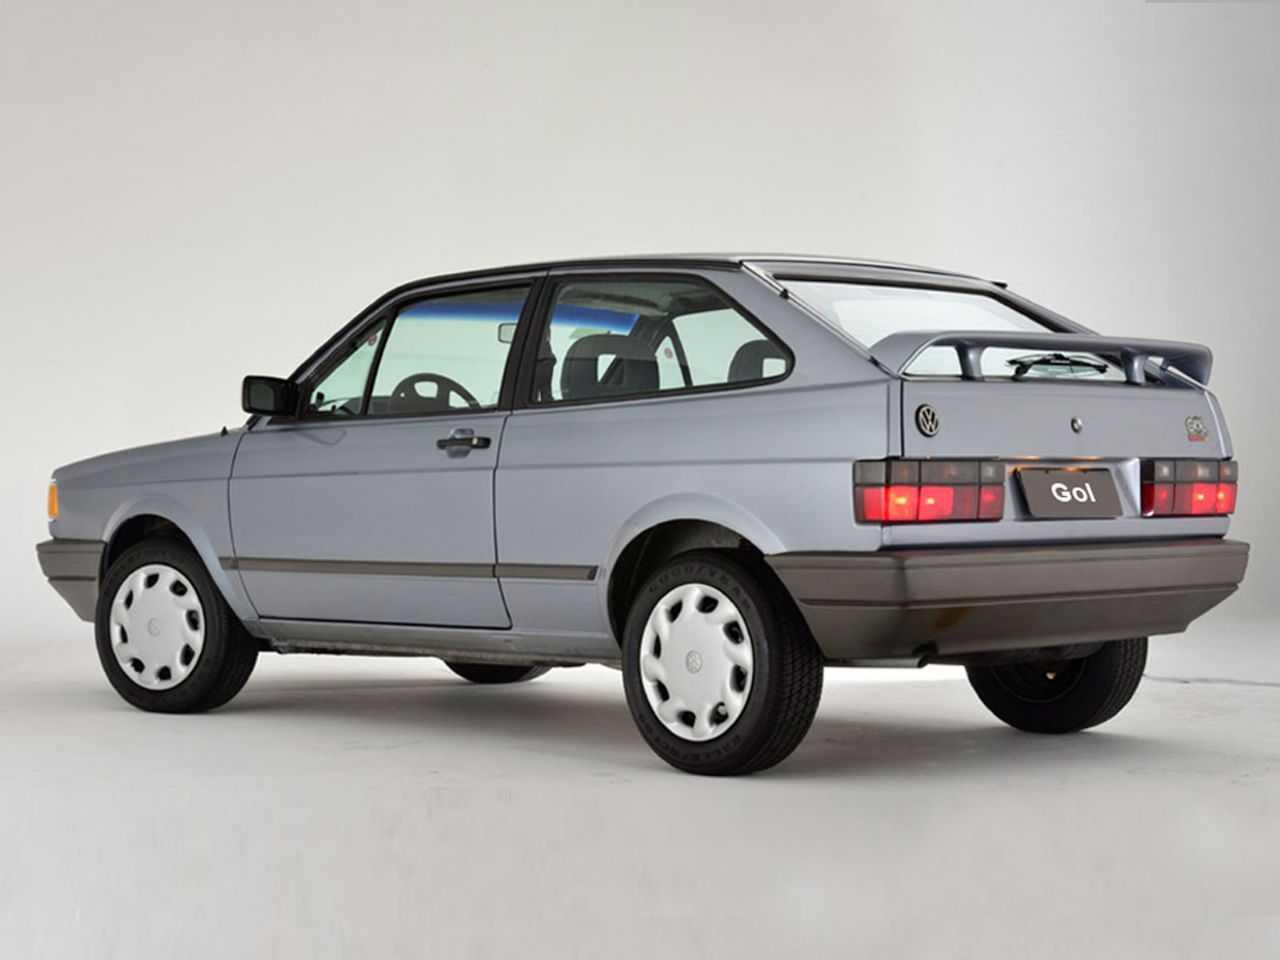 VolkswagenGol 1994 - ângulo traseiro